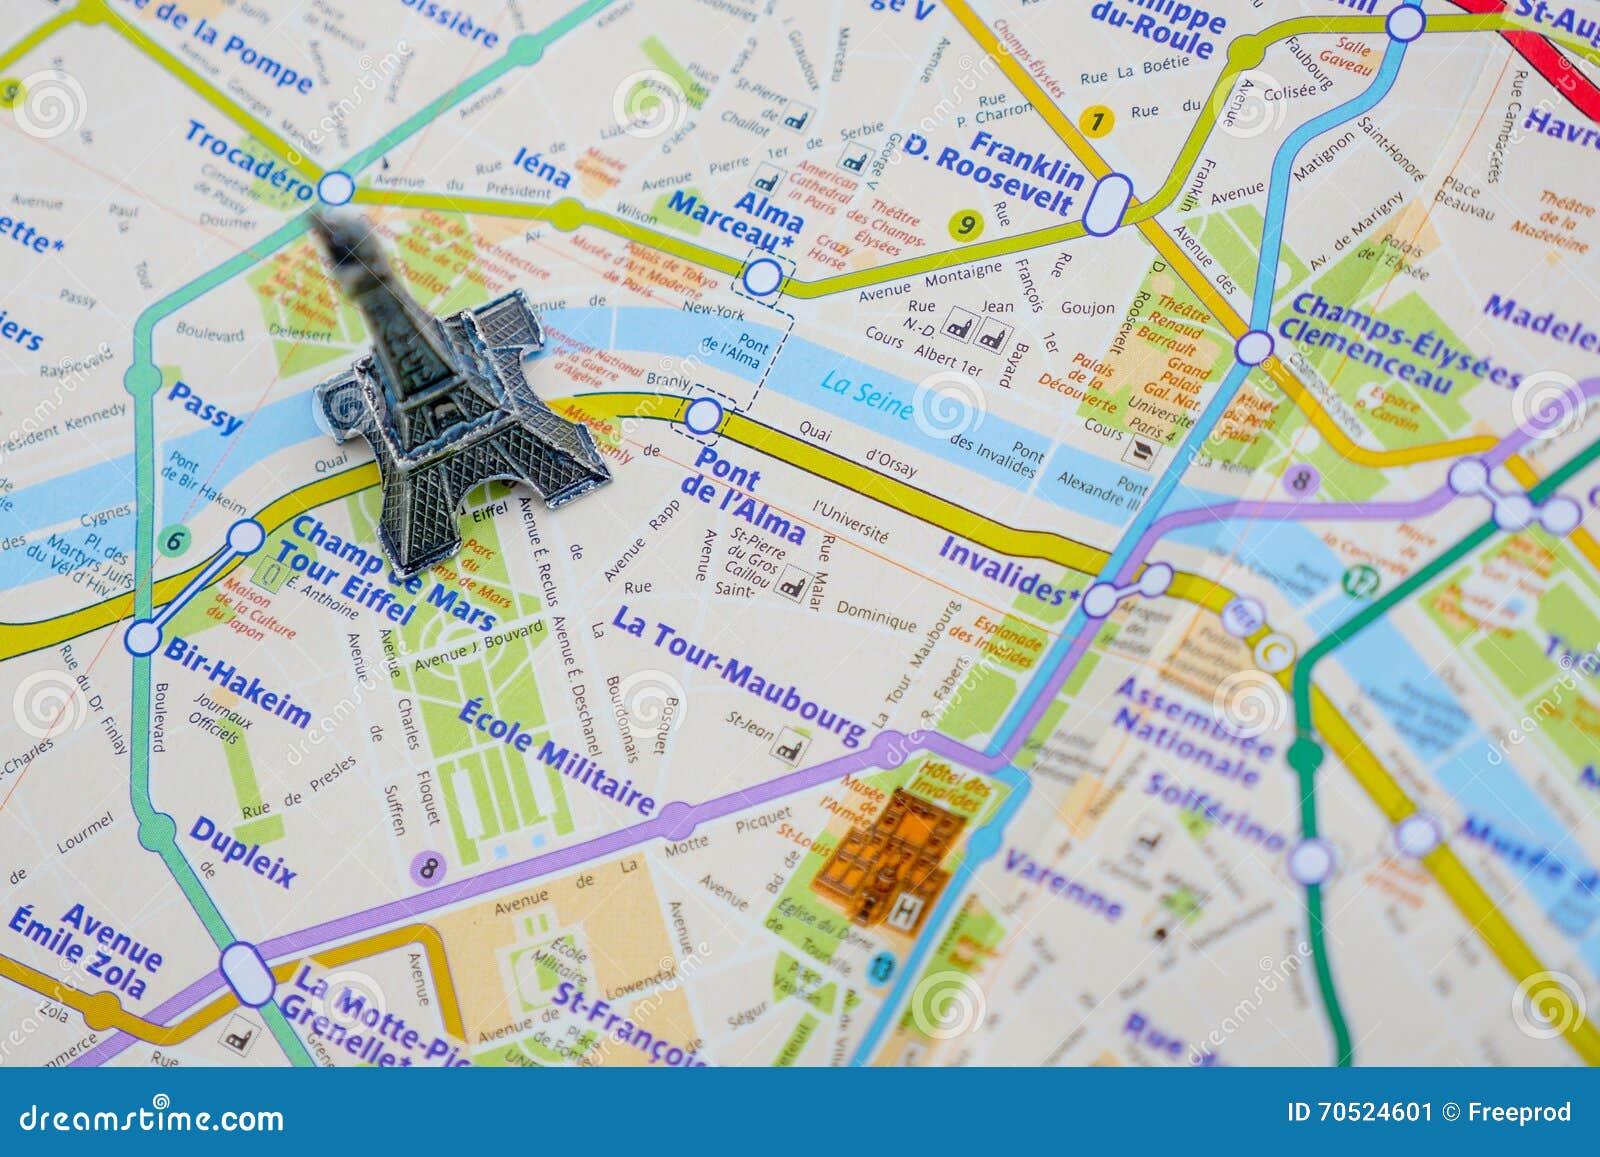 mapa paris torre eiffel Paris Name At A Map With Red Eiffel Tower Miniature Stock Image  mapa paris torre eiffel